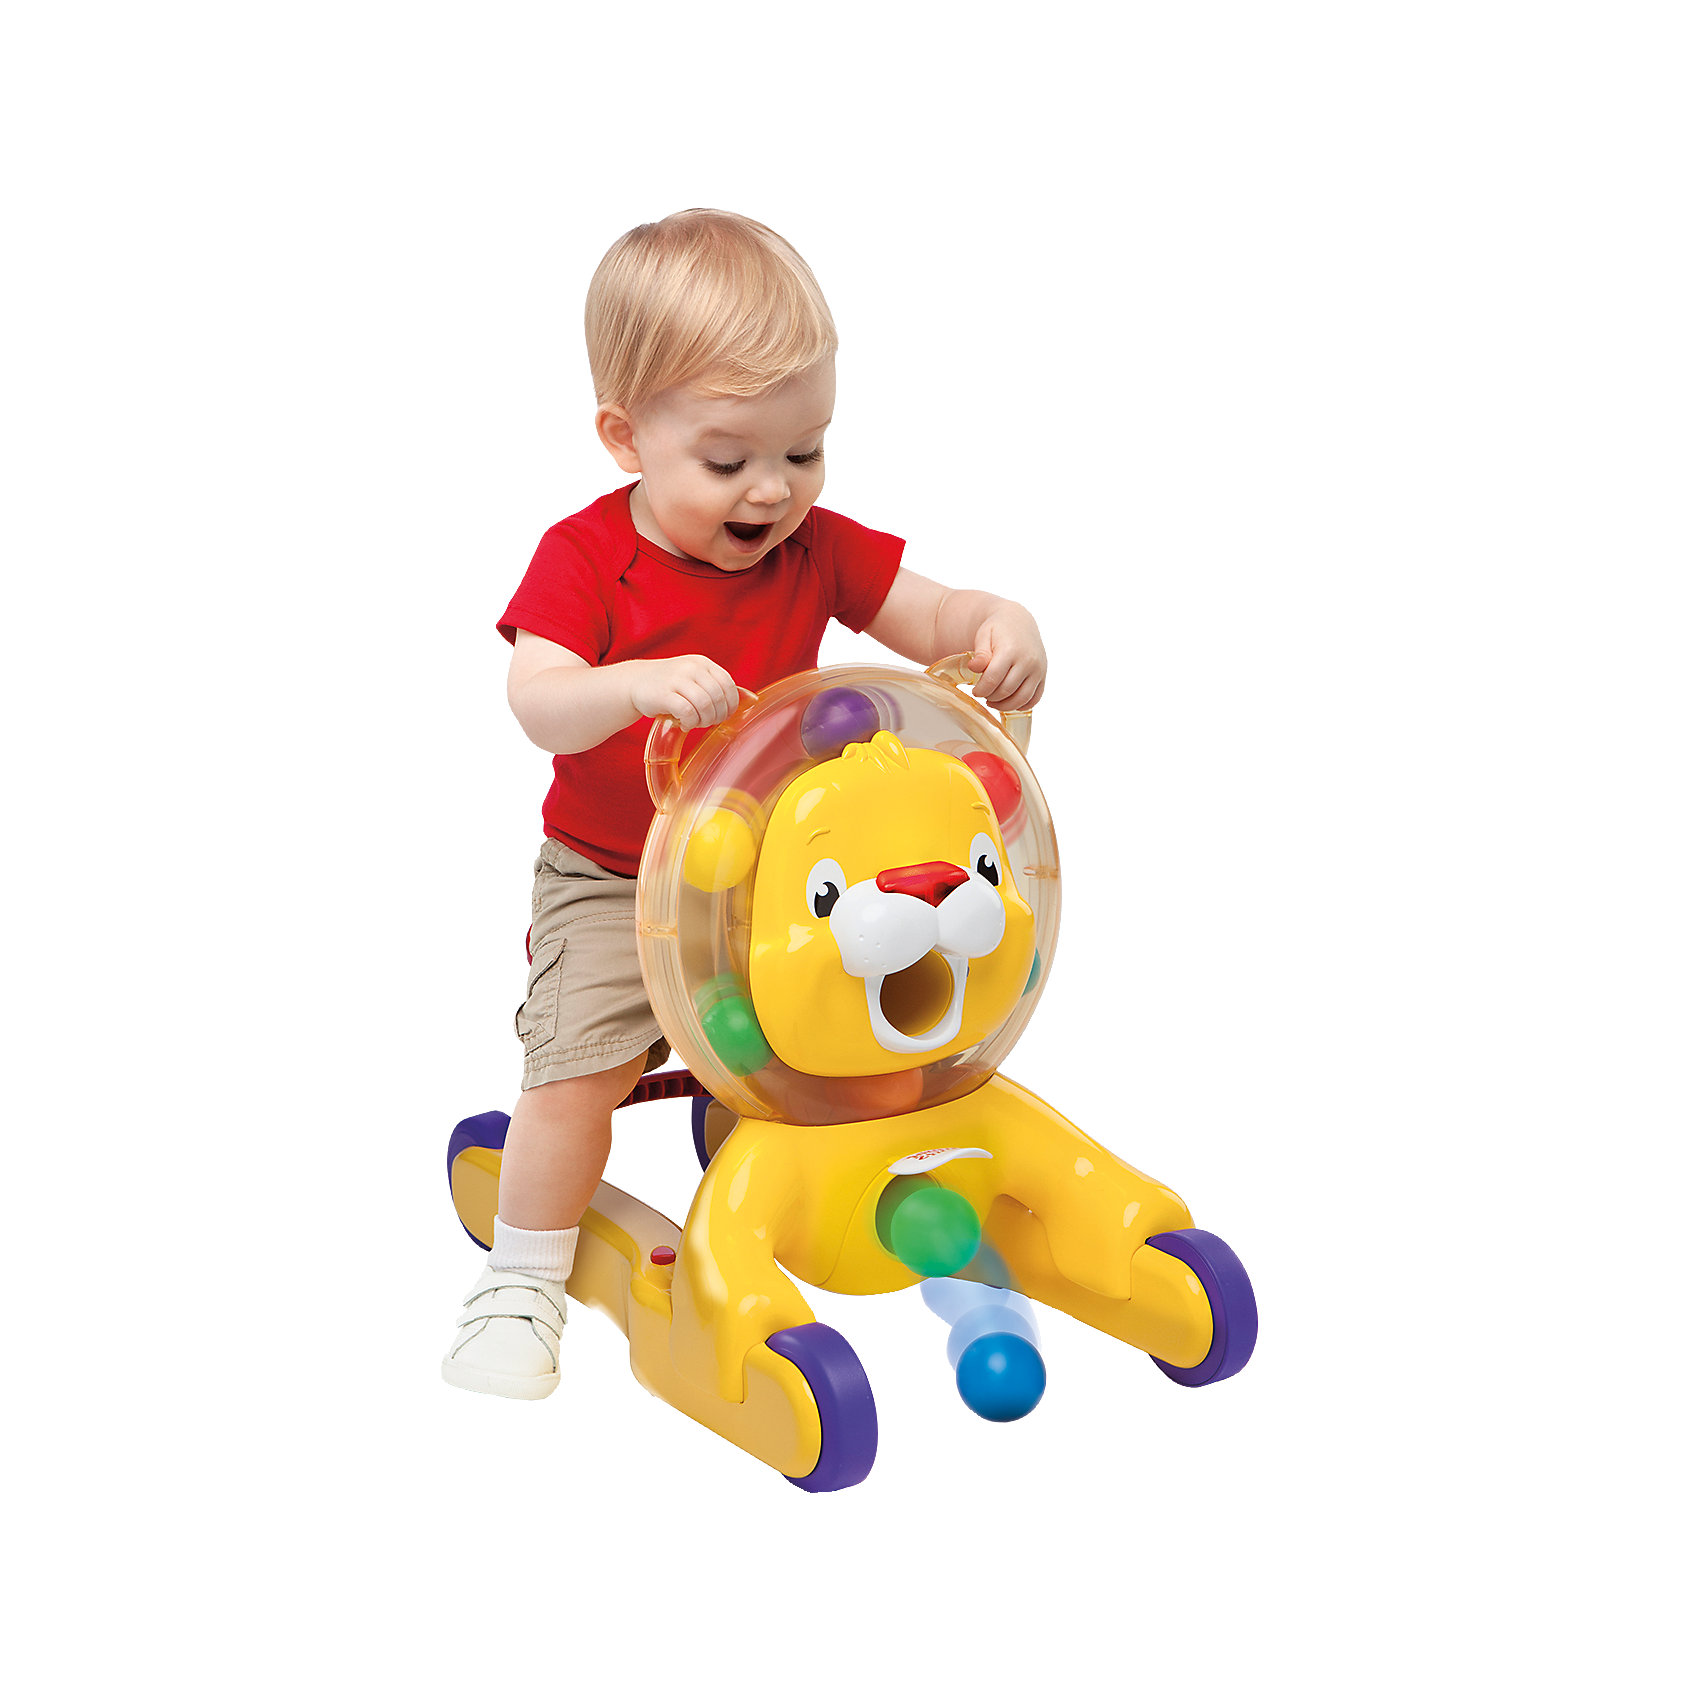 Kids II Ходунки-каталка Веселый лев, Bright Starts ходунки